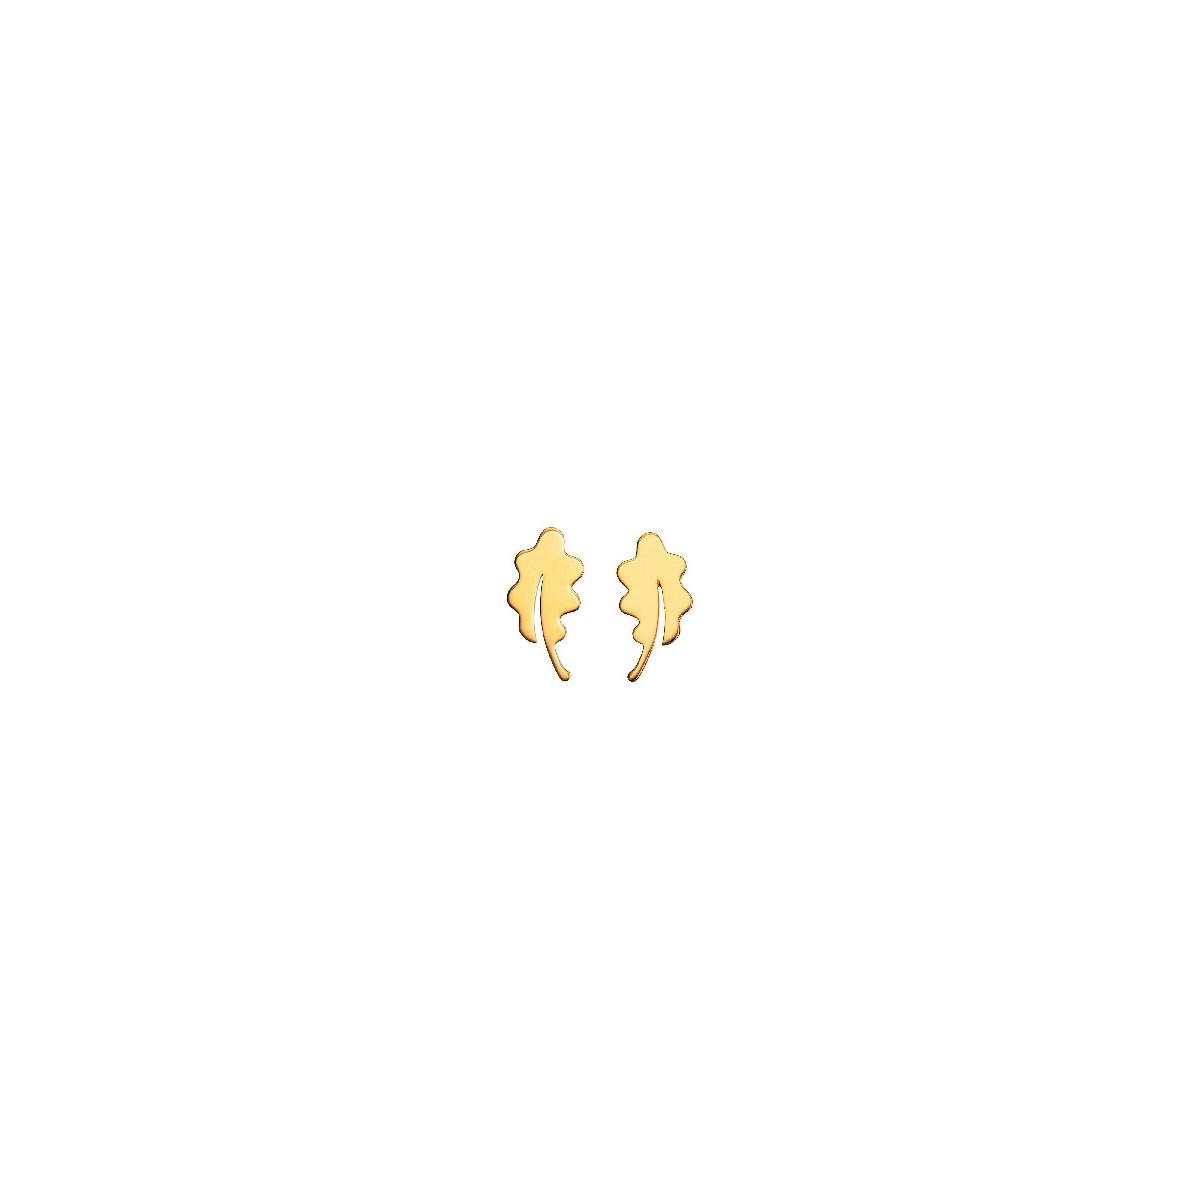 PENDIENTES PLATA - T0411253